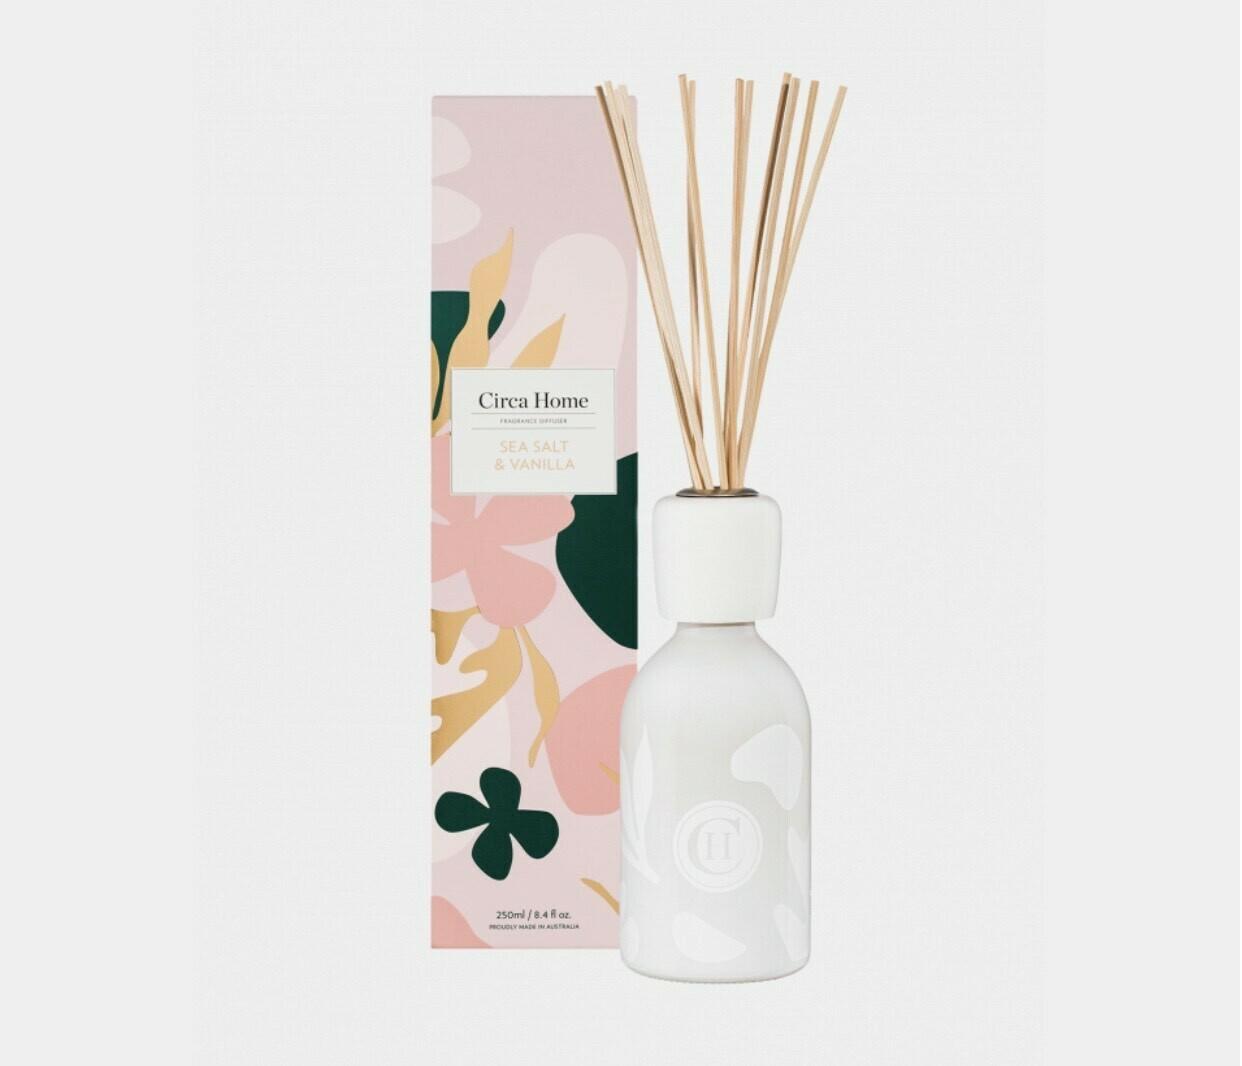 Circa Home Diffuser-Sea Salt & Vanilla 250ml